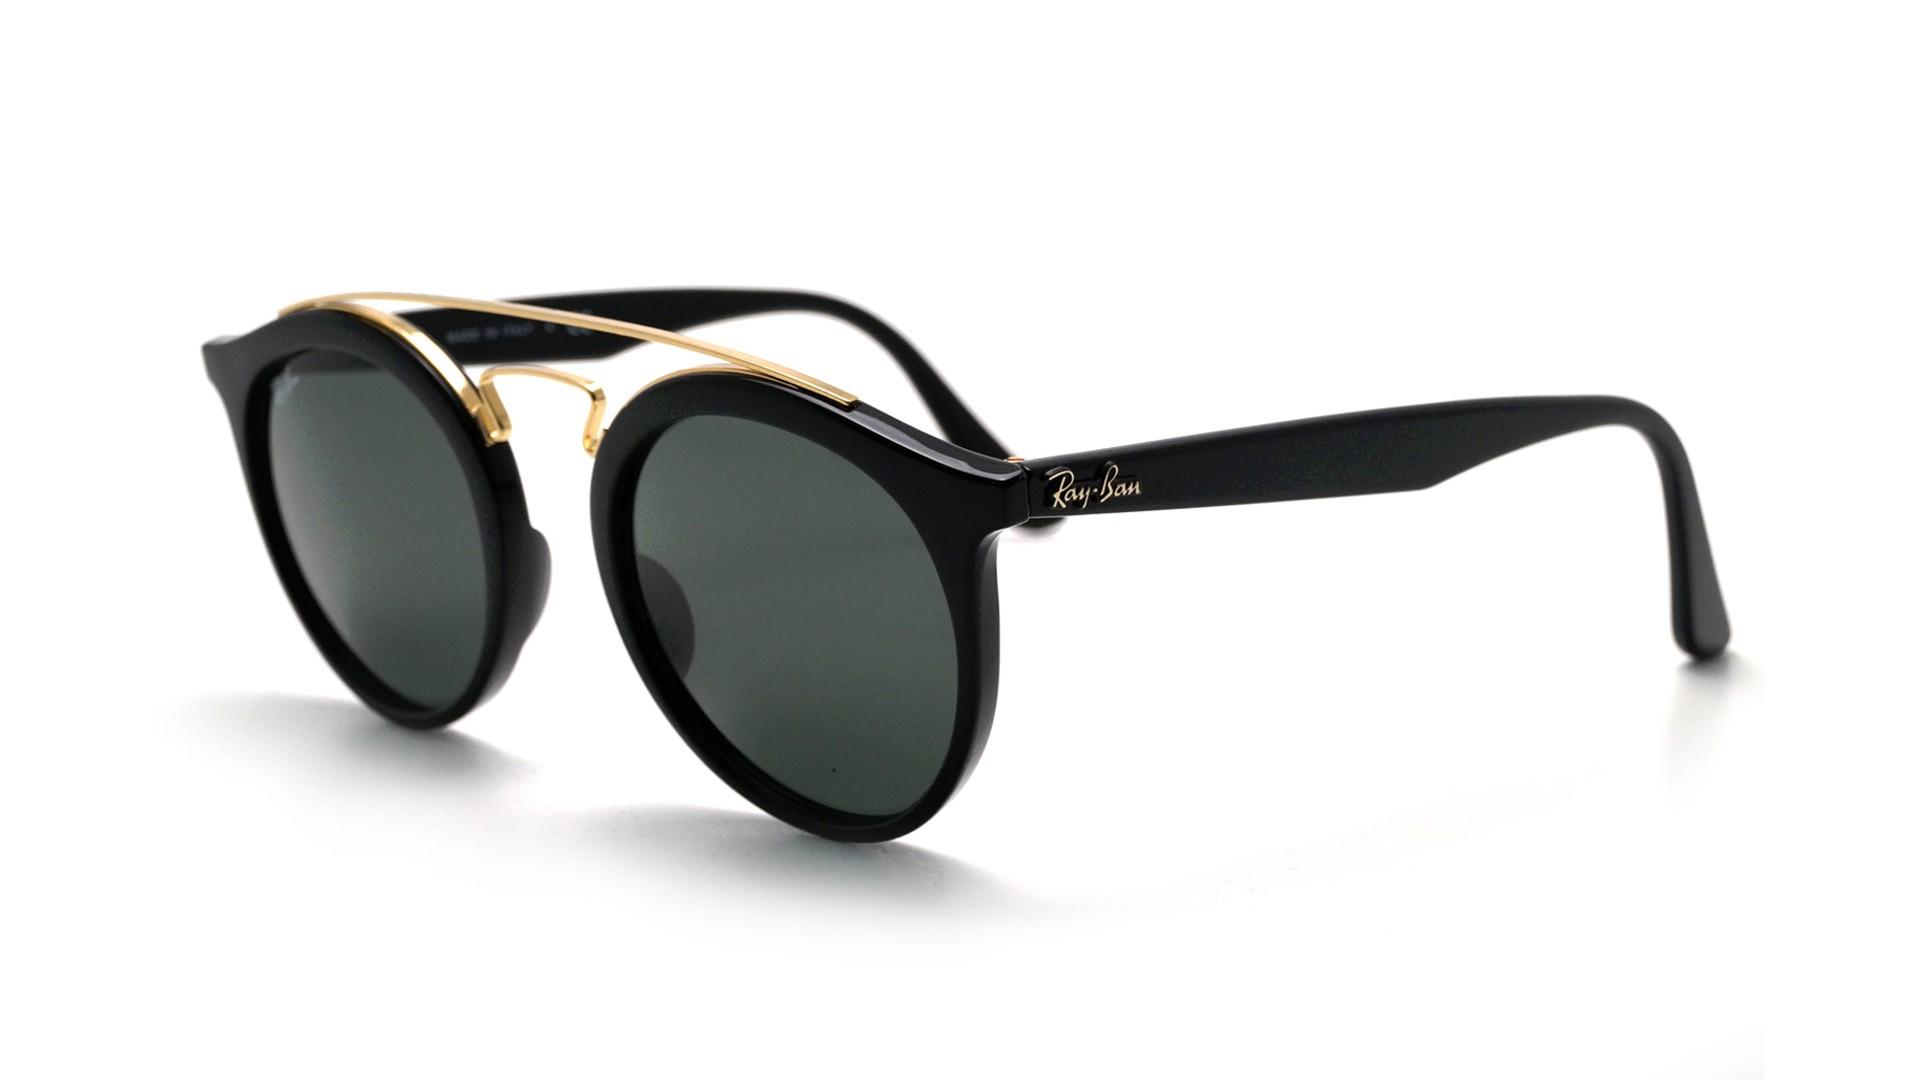 40905026e634fc Ray-Ban New Gatsby Noir RB4256 601 71 49-20   Prix 63,96 €   Visiofactory